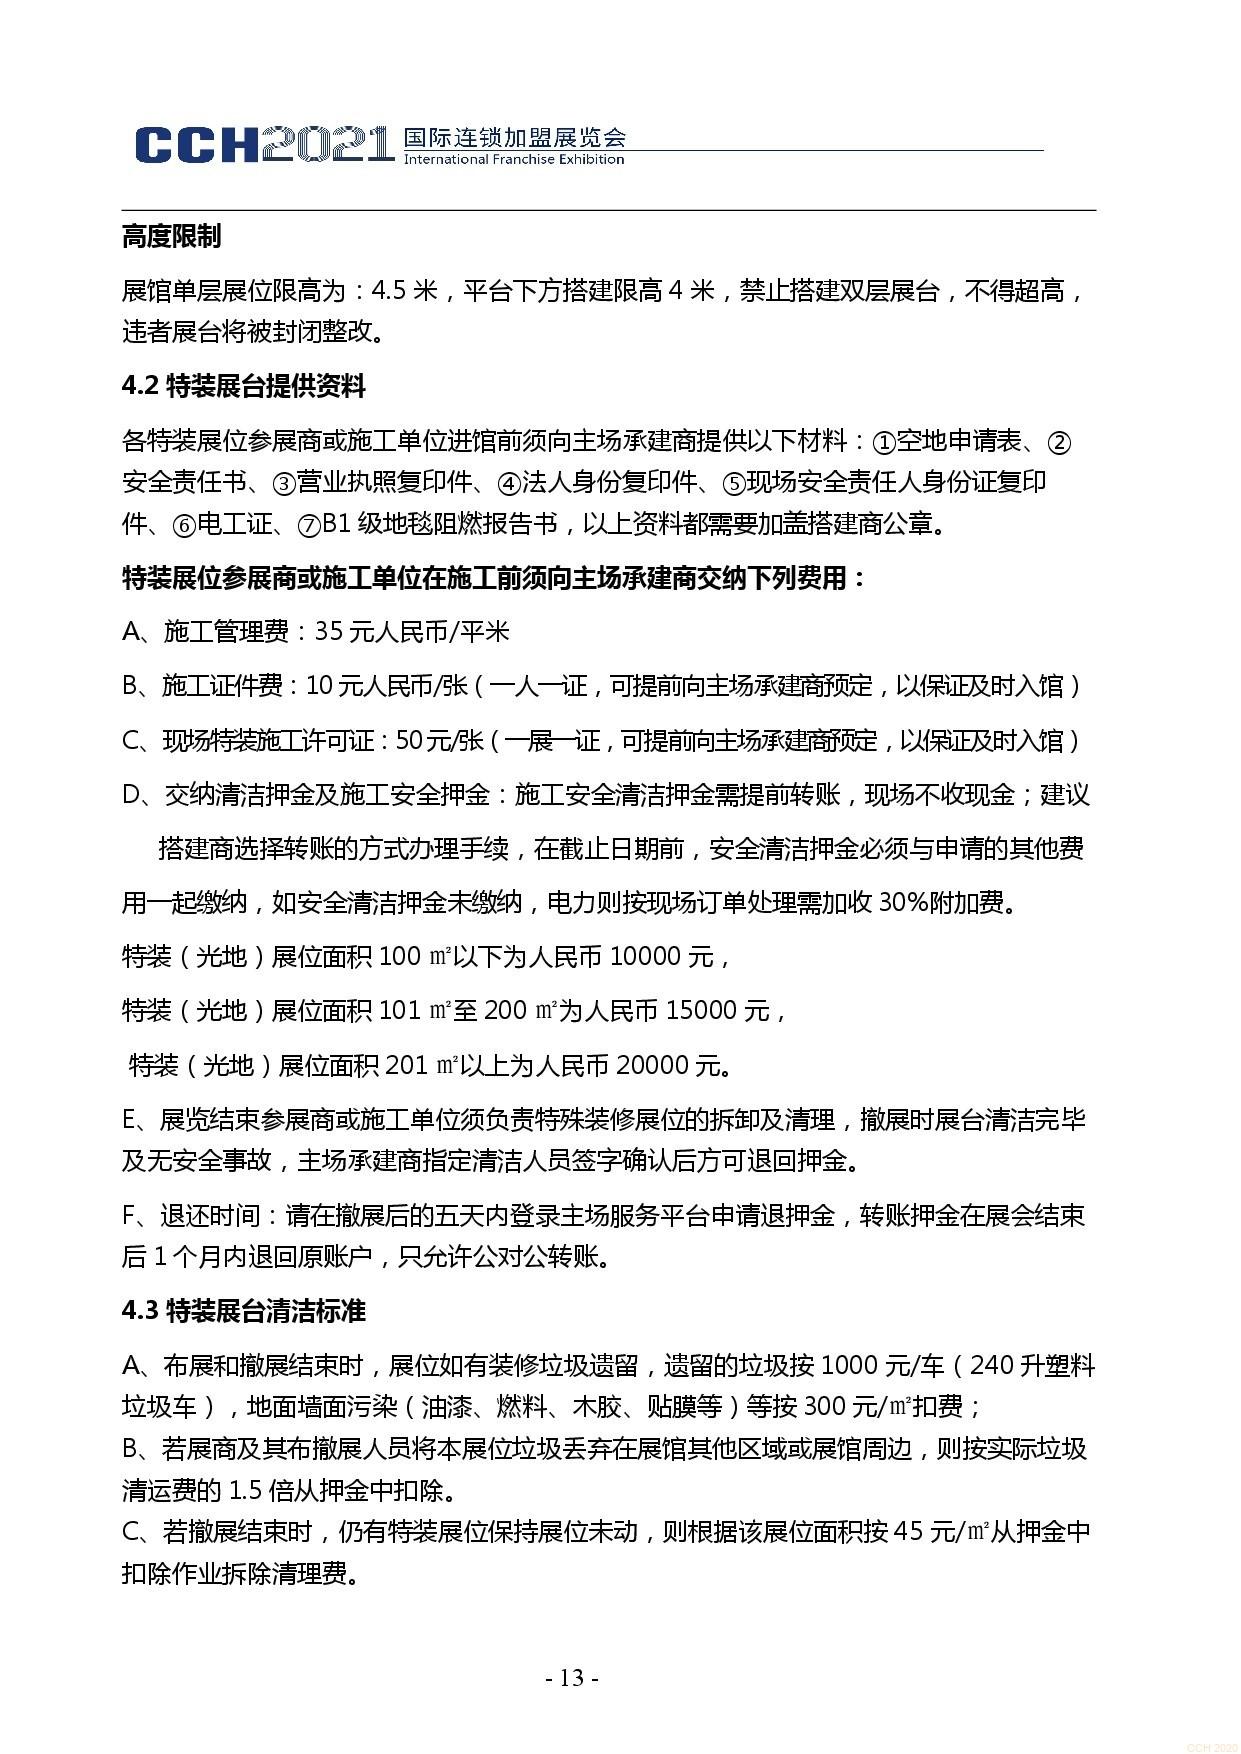 0416CCH深圳展参展商手册4.16-013.jpg